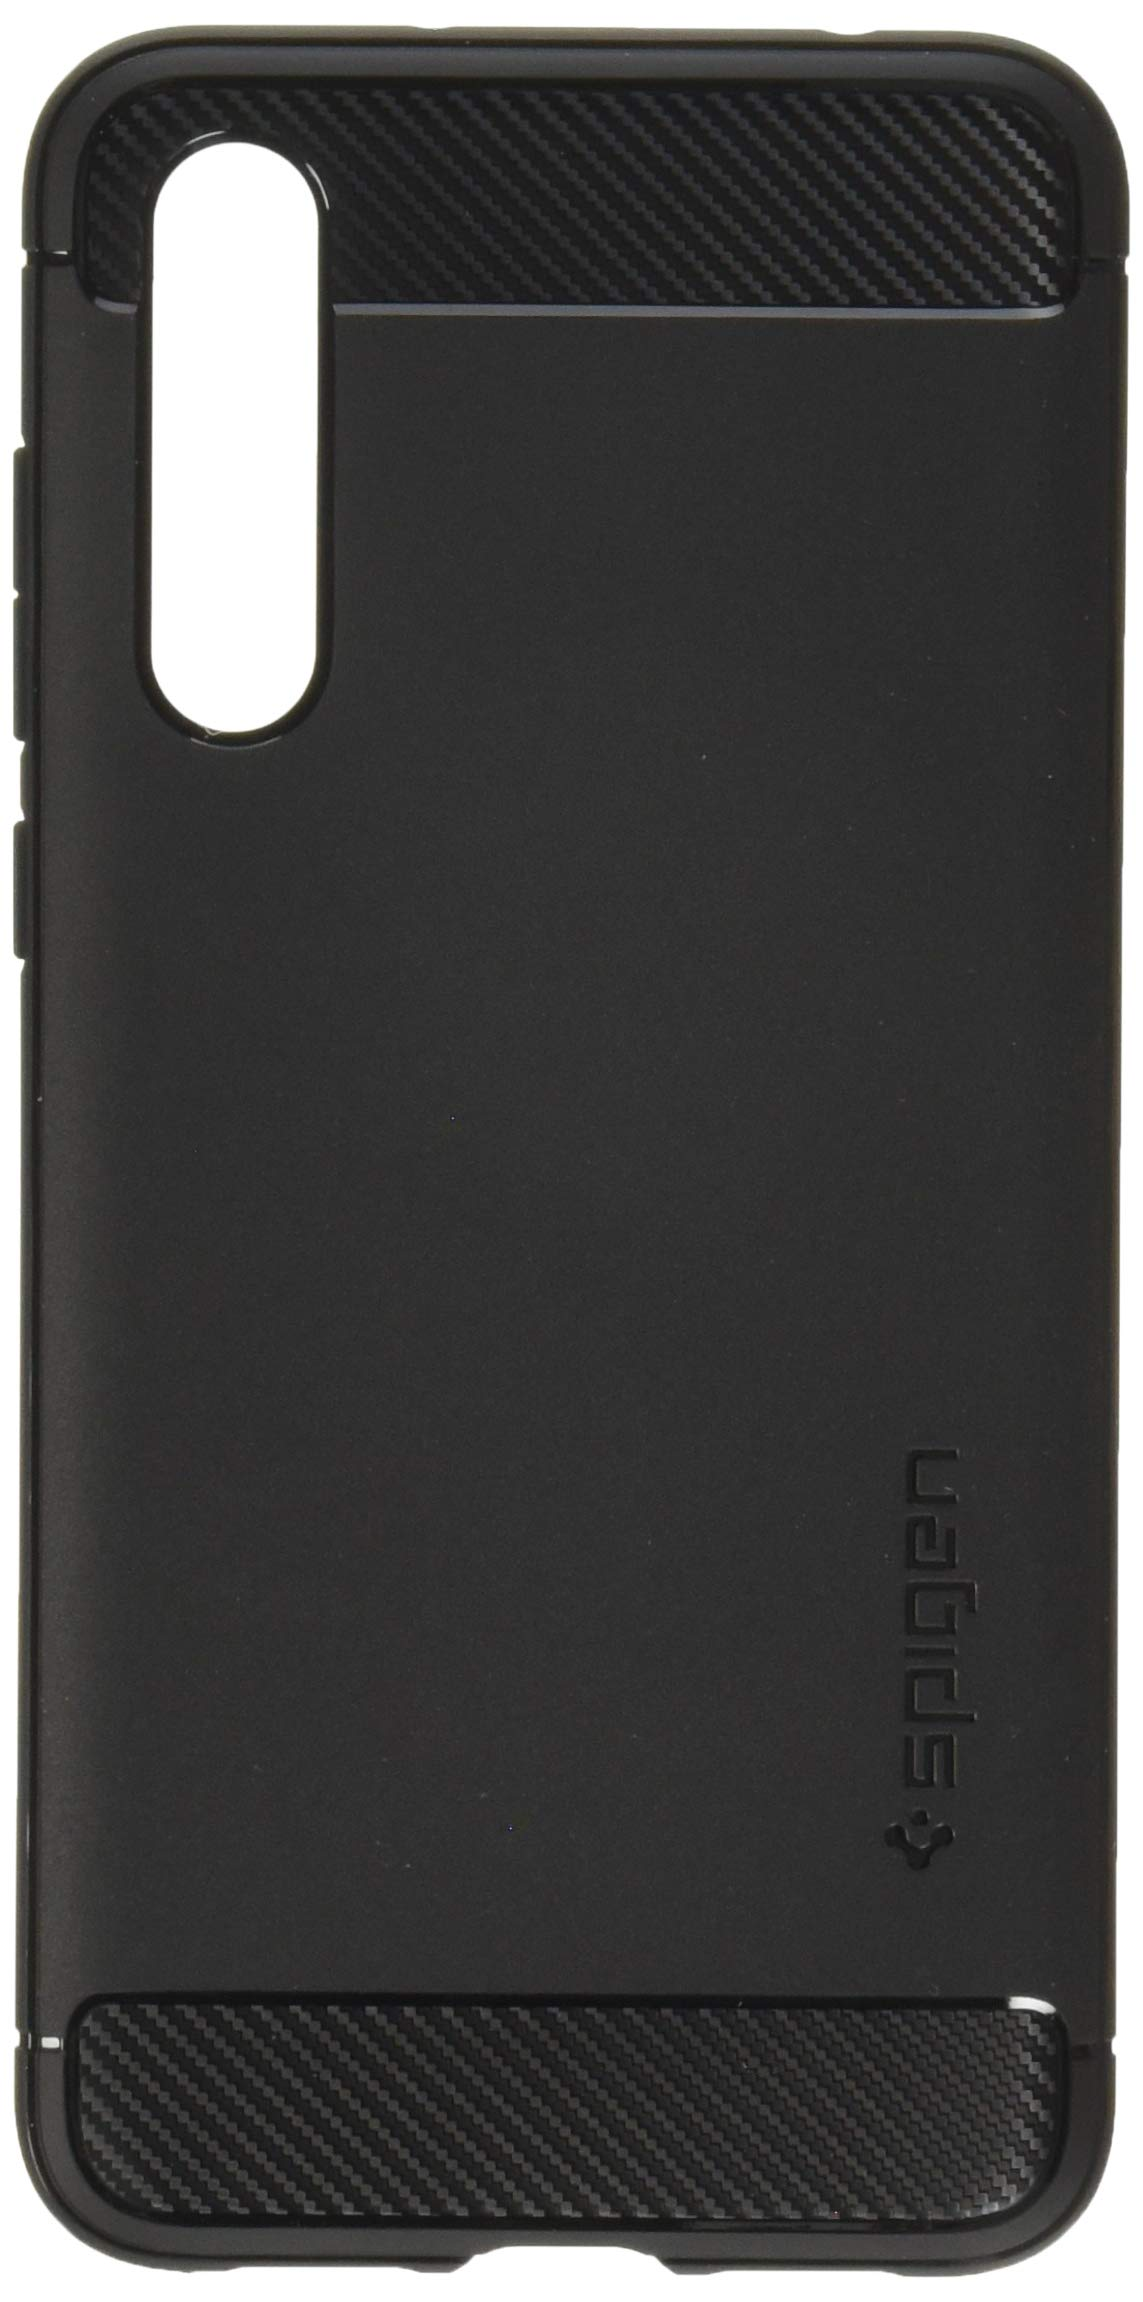 quality design 4c396 123f4 Spigen Huawei P20 PRO Rugged Armor cover/case - Black